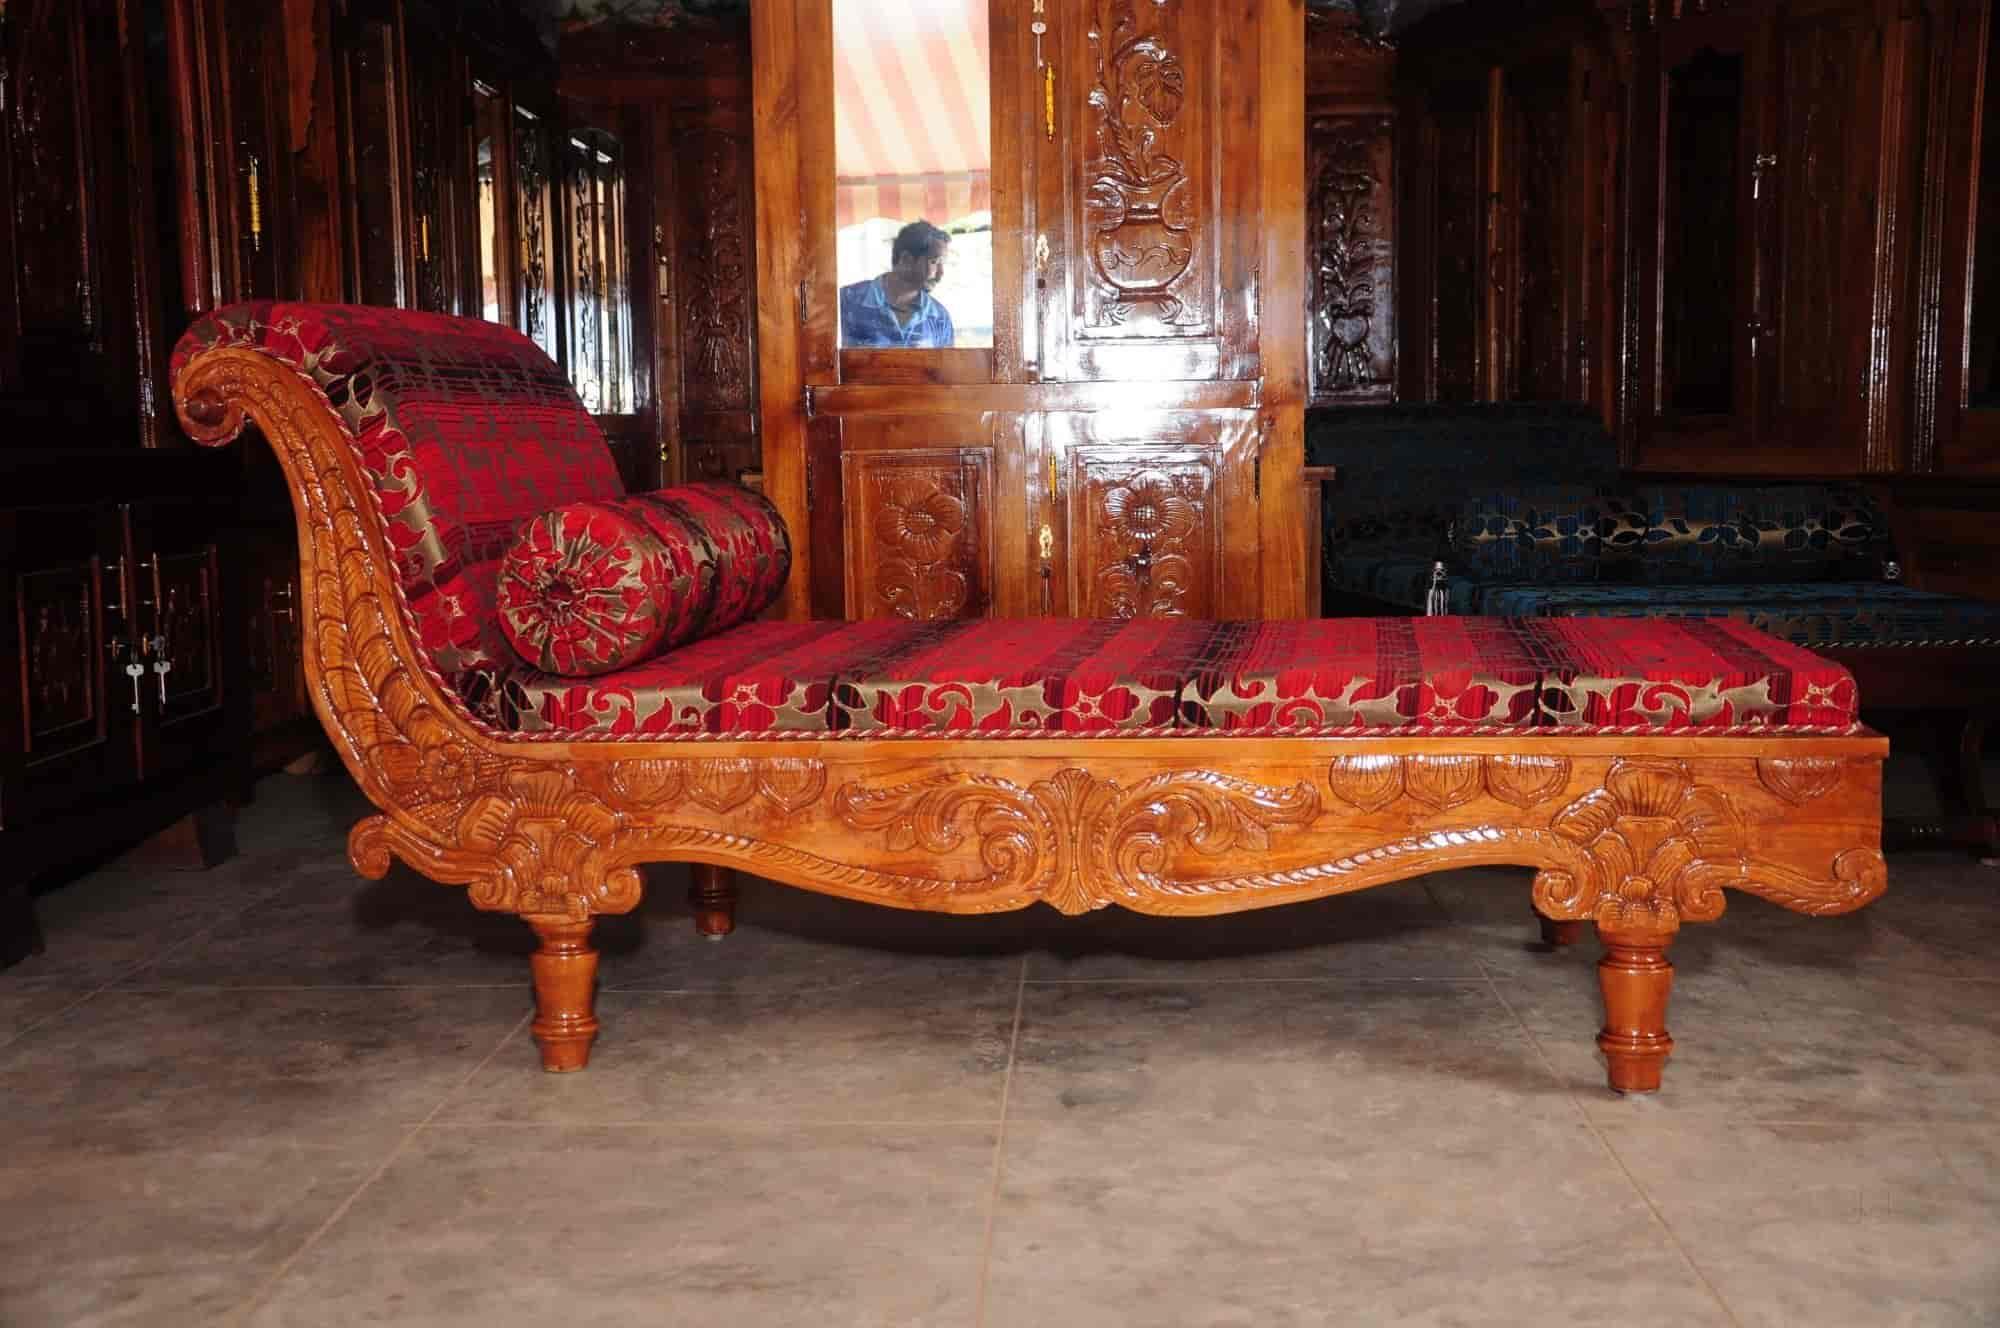 Merveilleux Royal Furniture